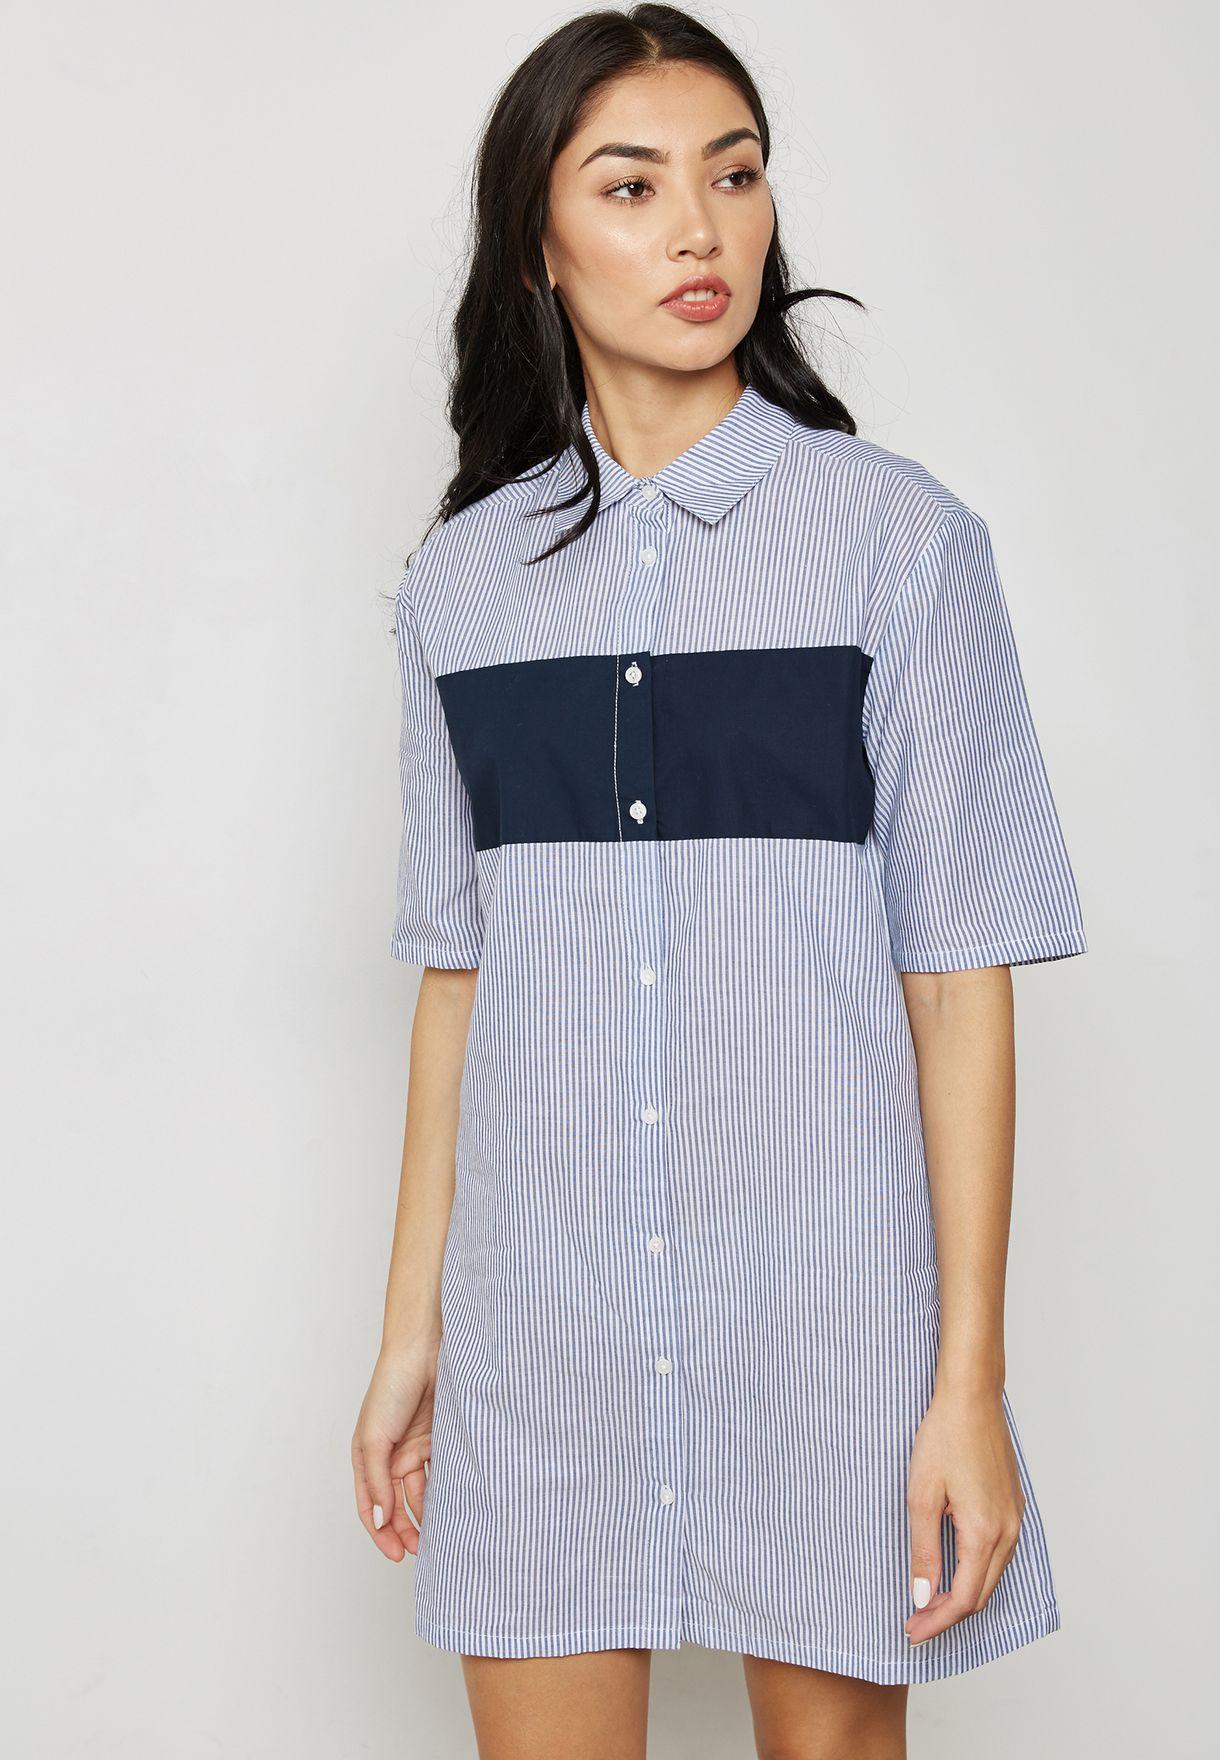 d70a22d542 Shop Mango stripes Striped Shirt Dress 23080335 for Women in UAE ...